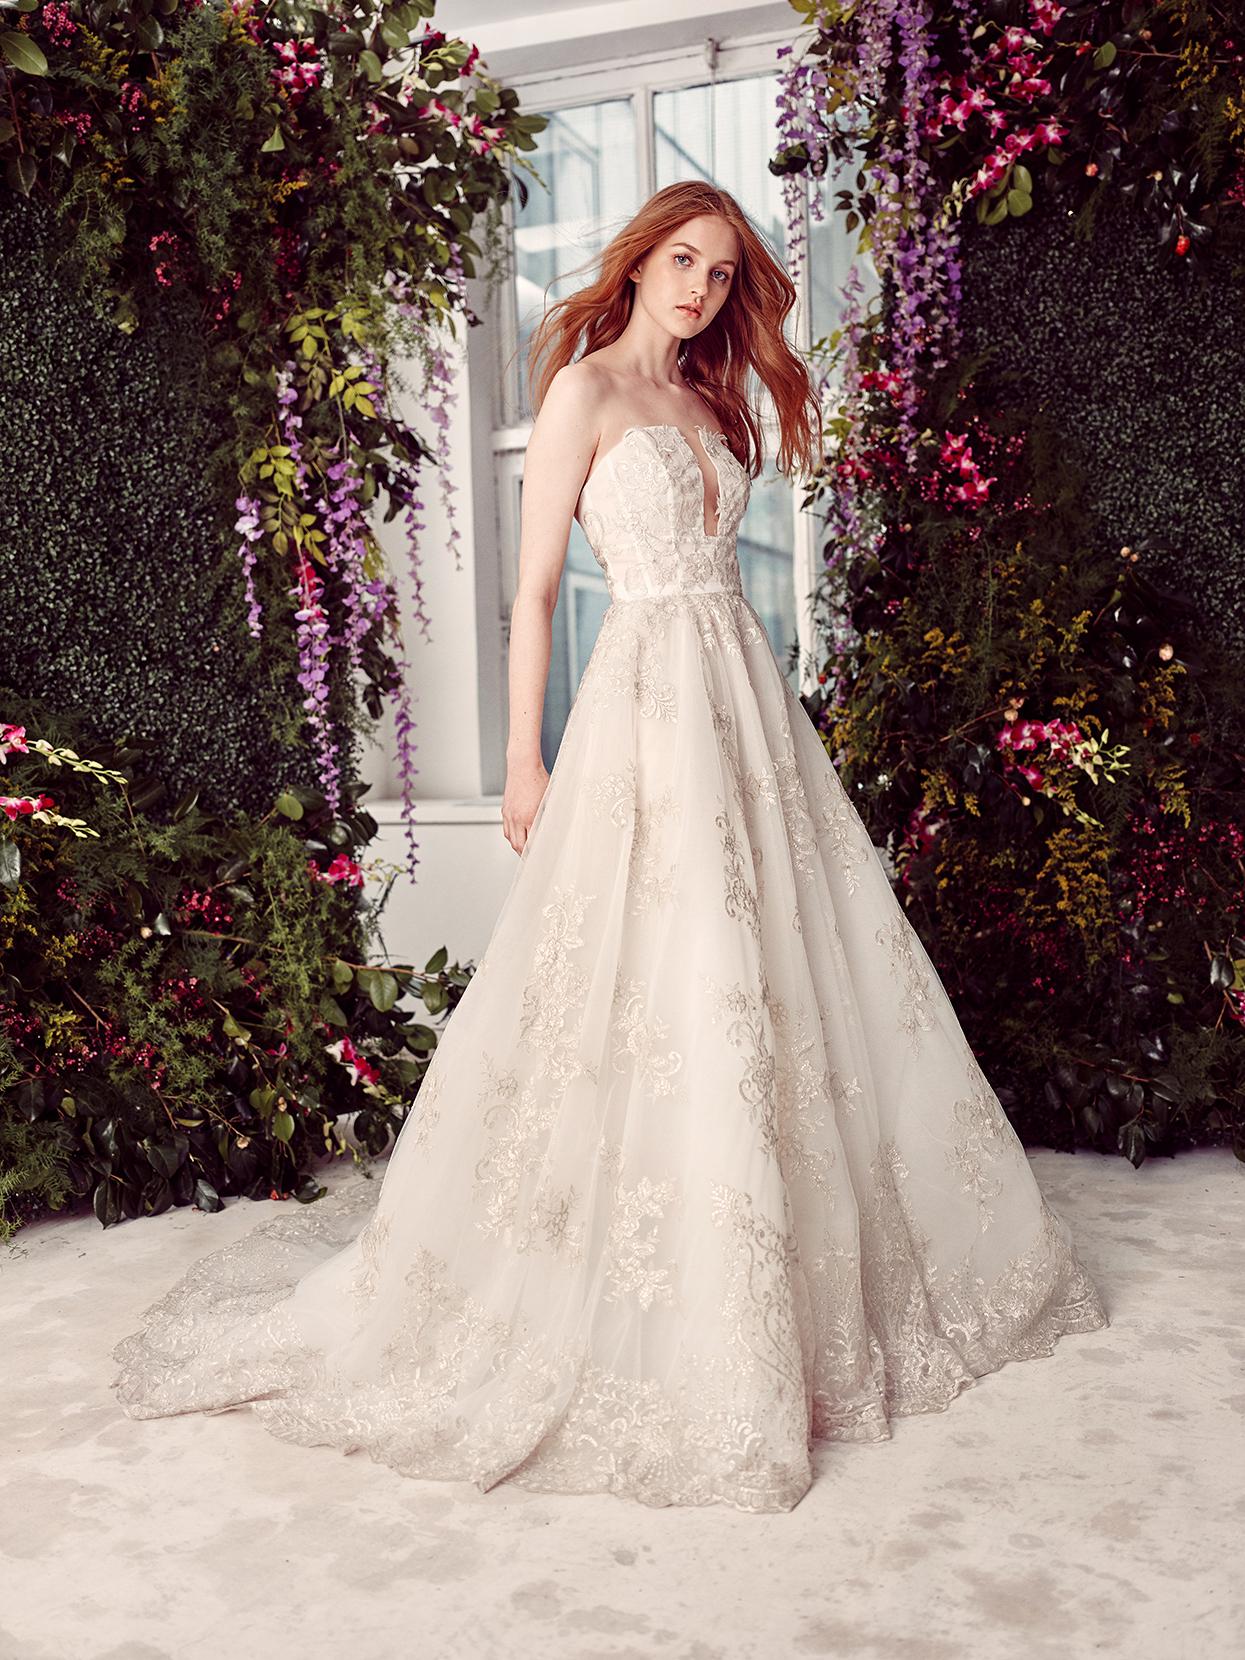 alyne by rita vinieris strapless a-line wedding dress spring 2020